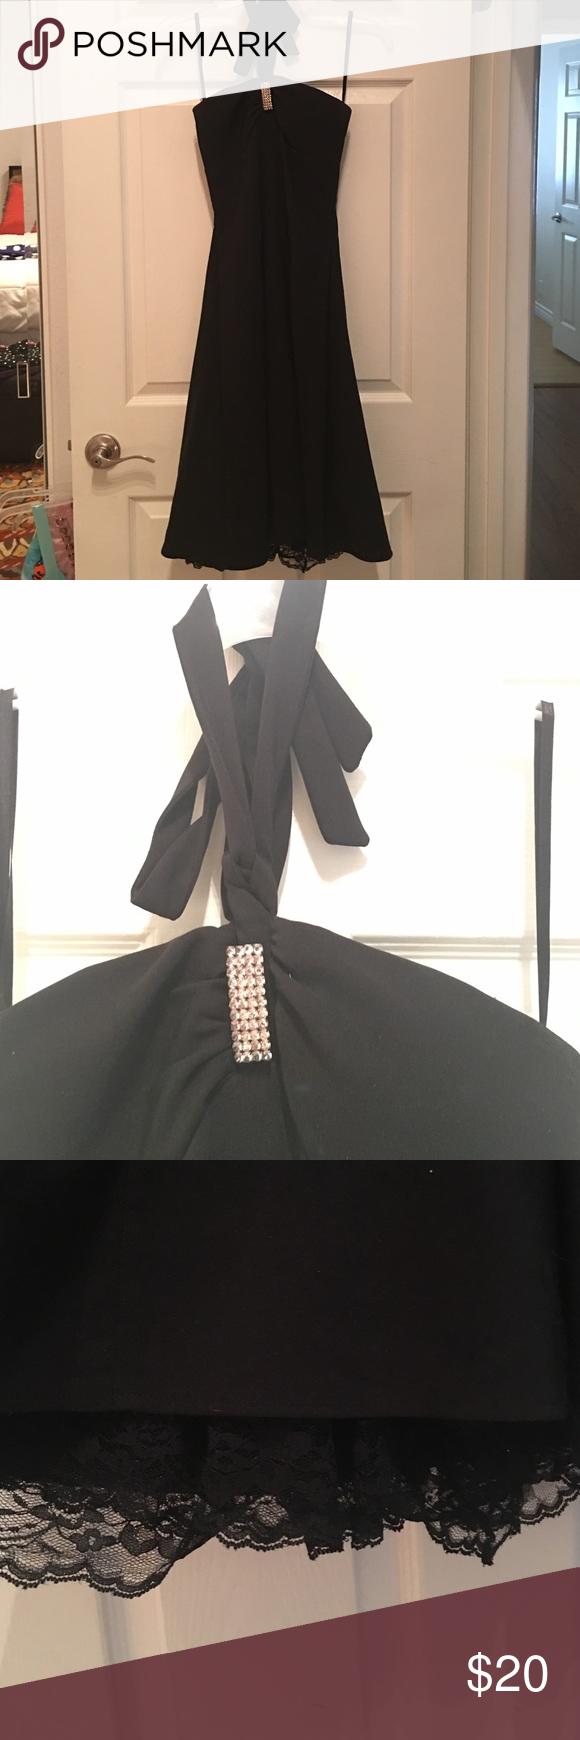 Black halter dress gorgeous black halter dress pefect for a school